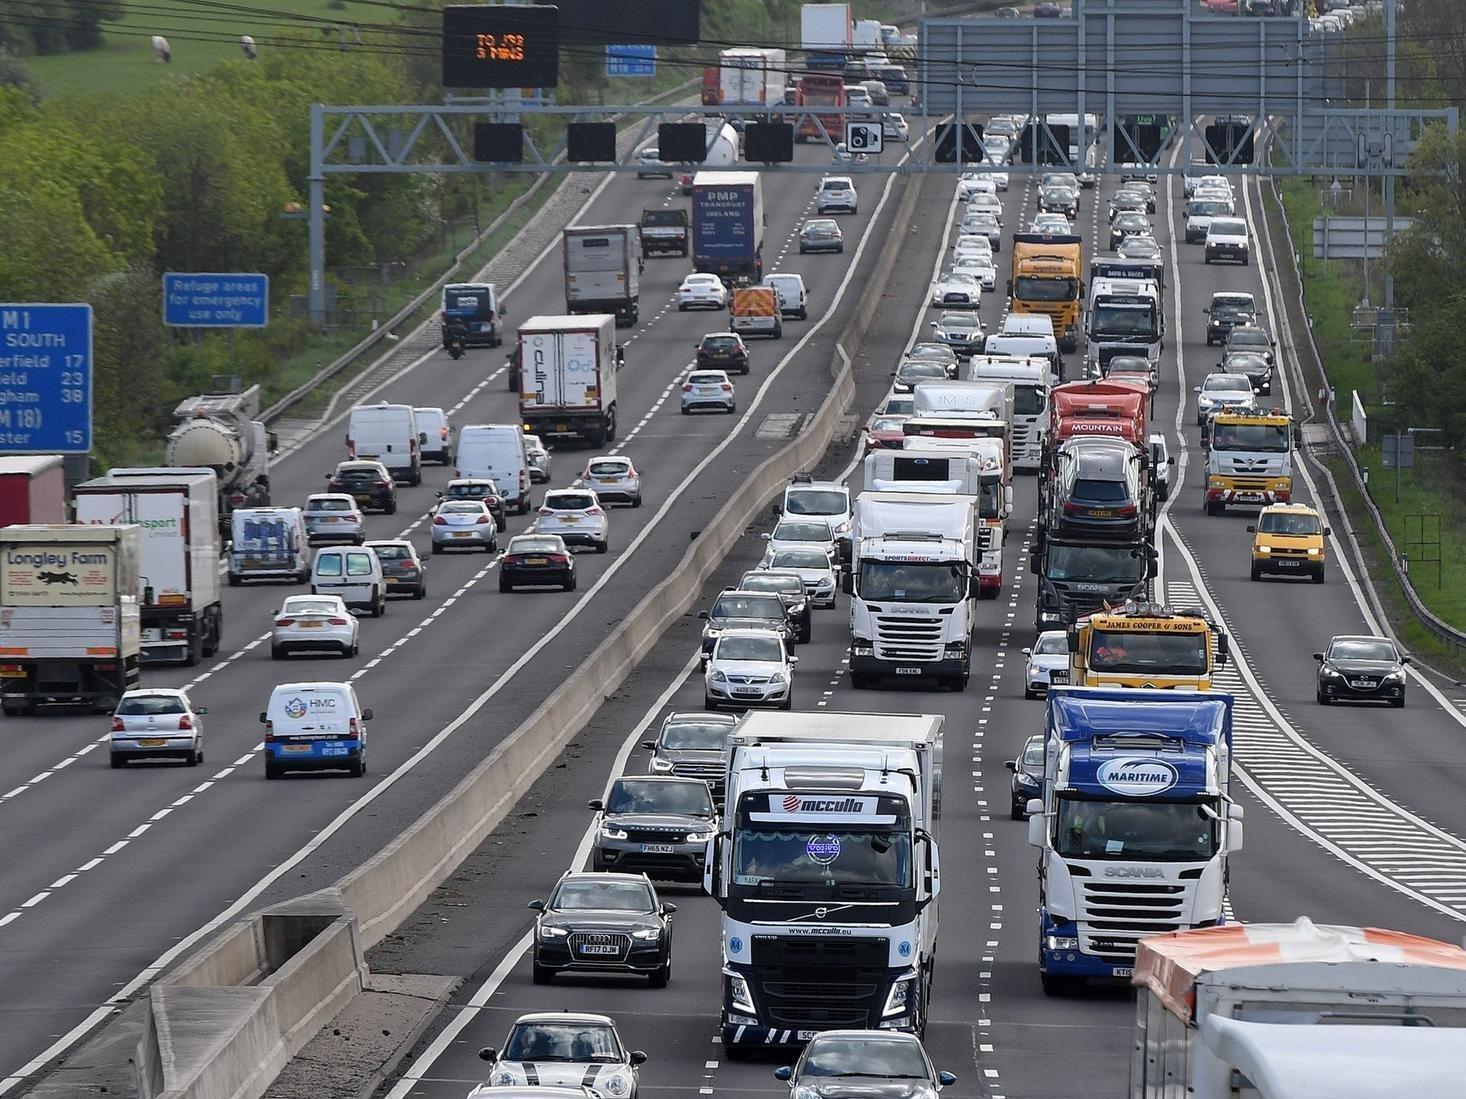 Traffic delays likely across Sheffield as roadworks carried